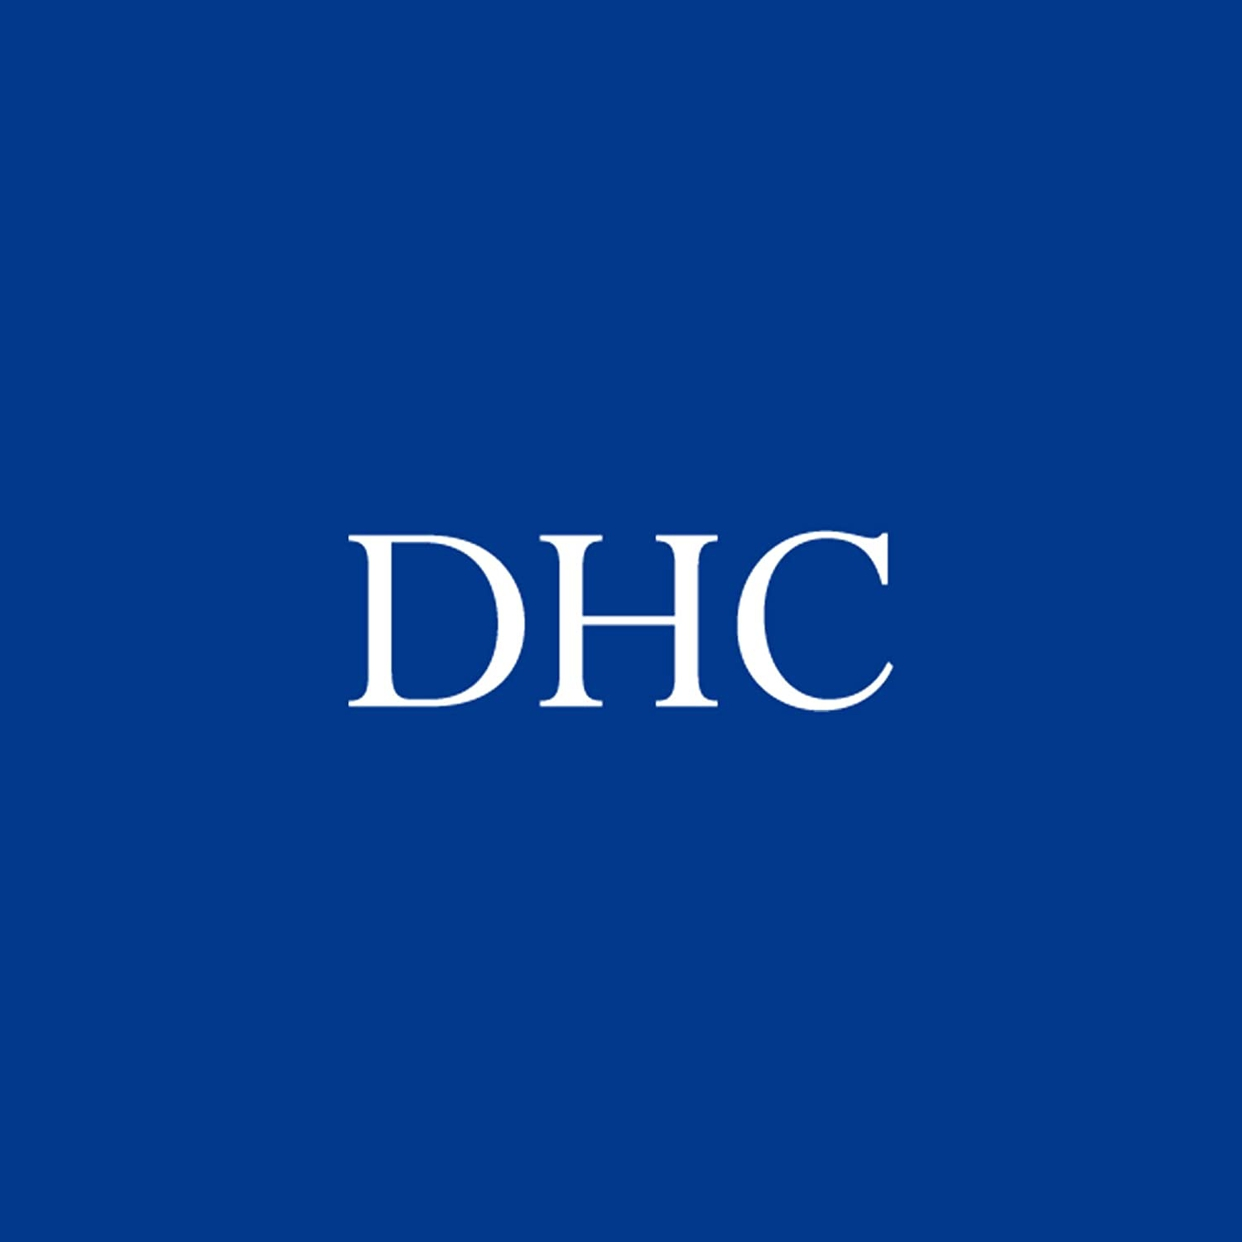 DHC(ディーエイチシー) 薬用フェーシャルスクラブの商品画像7